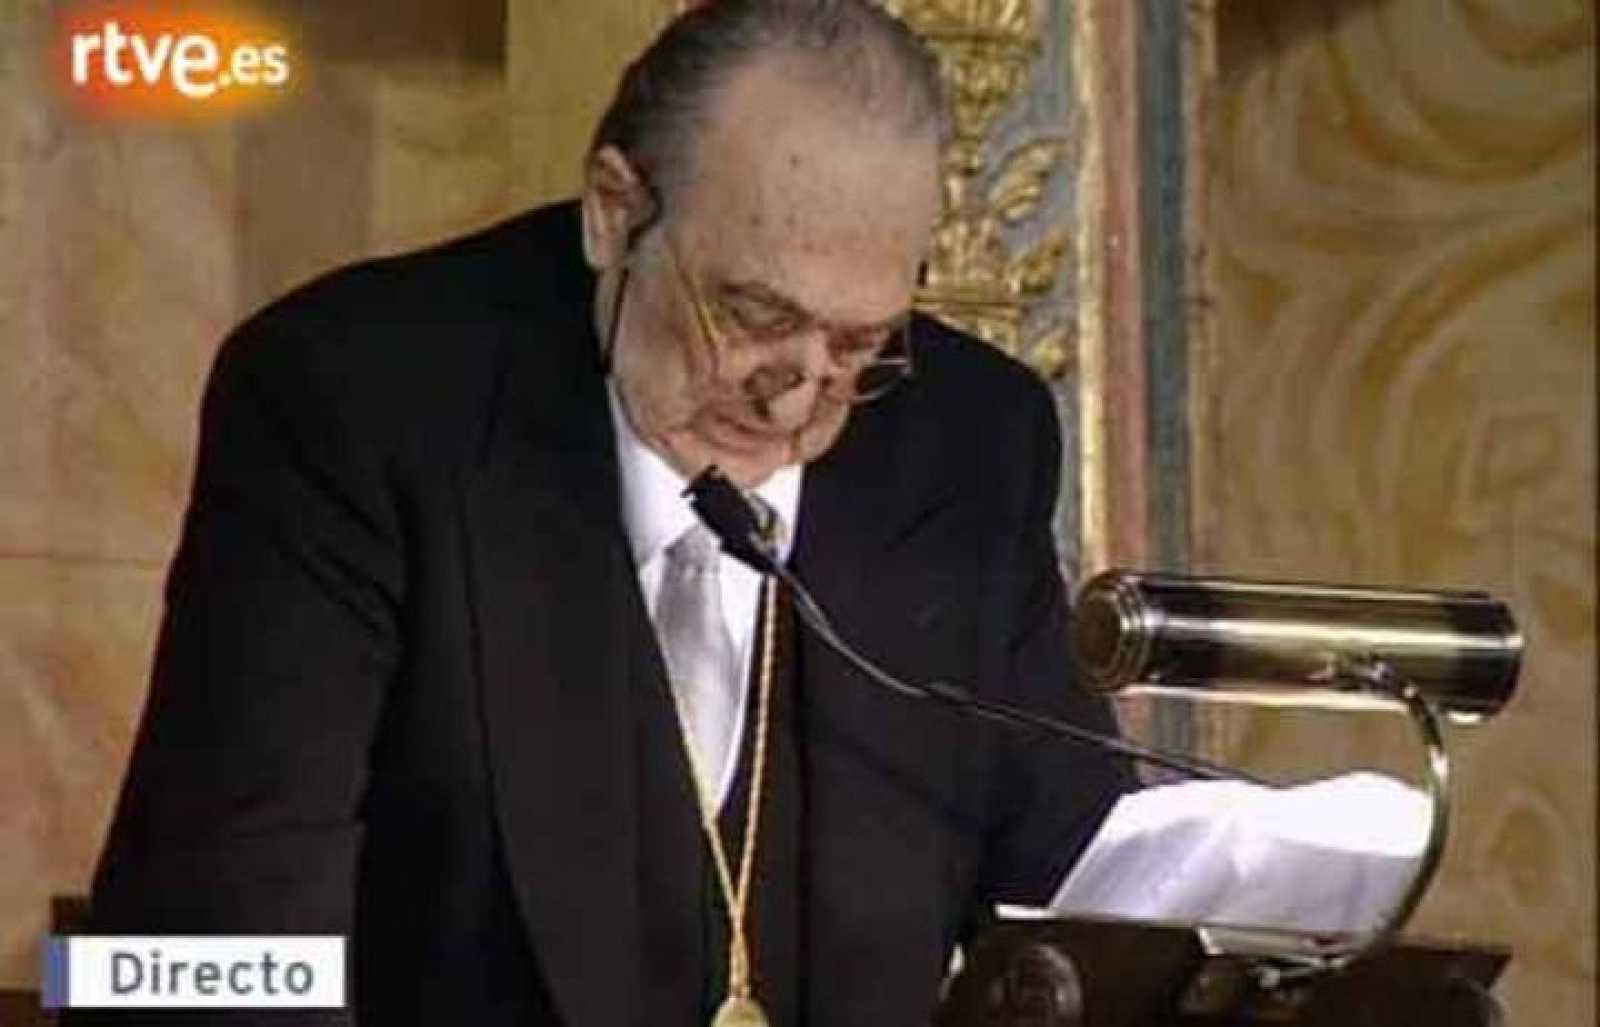 Discurso Rafael Sánchez Ferlosio 2004